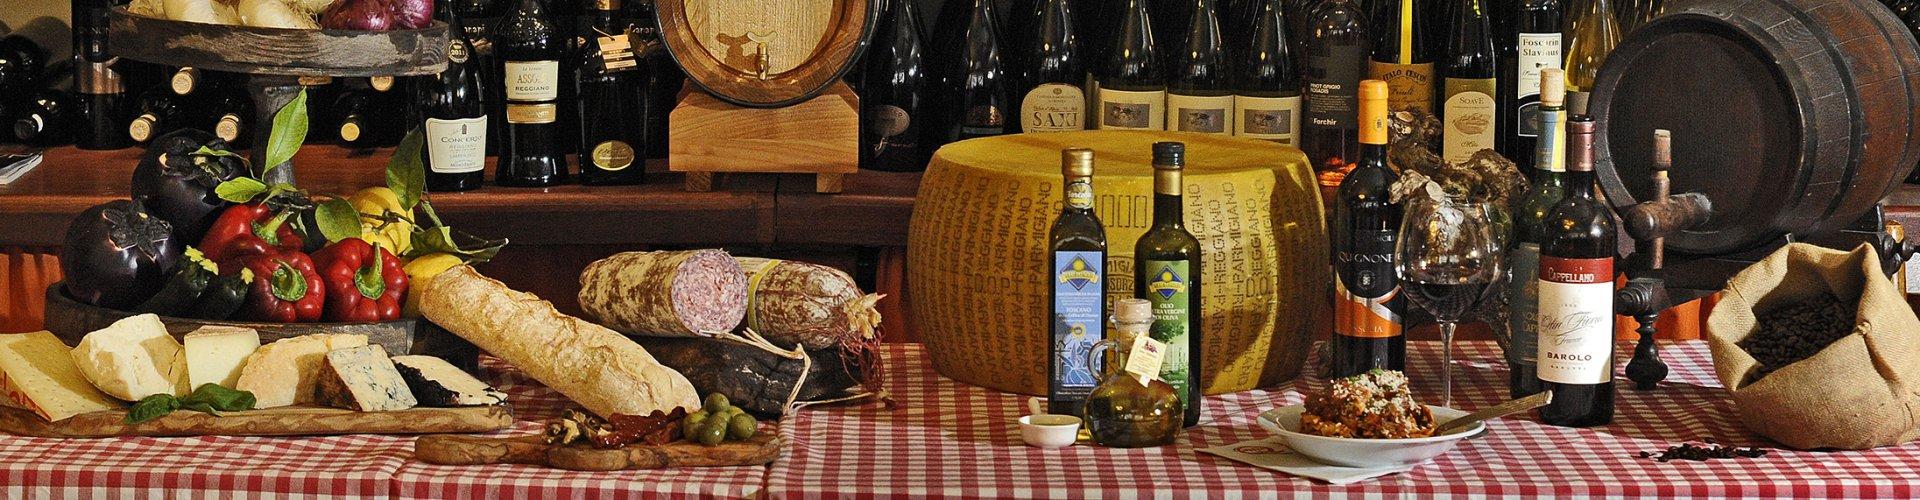 Italiaanse delicatessen overzicht il tartufo Delft